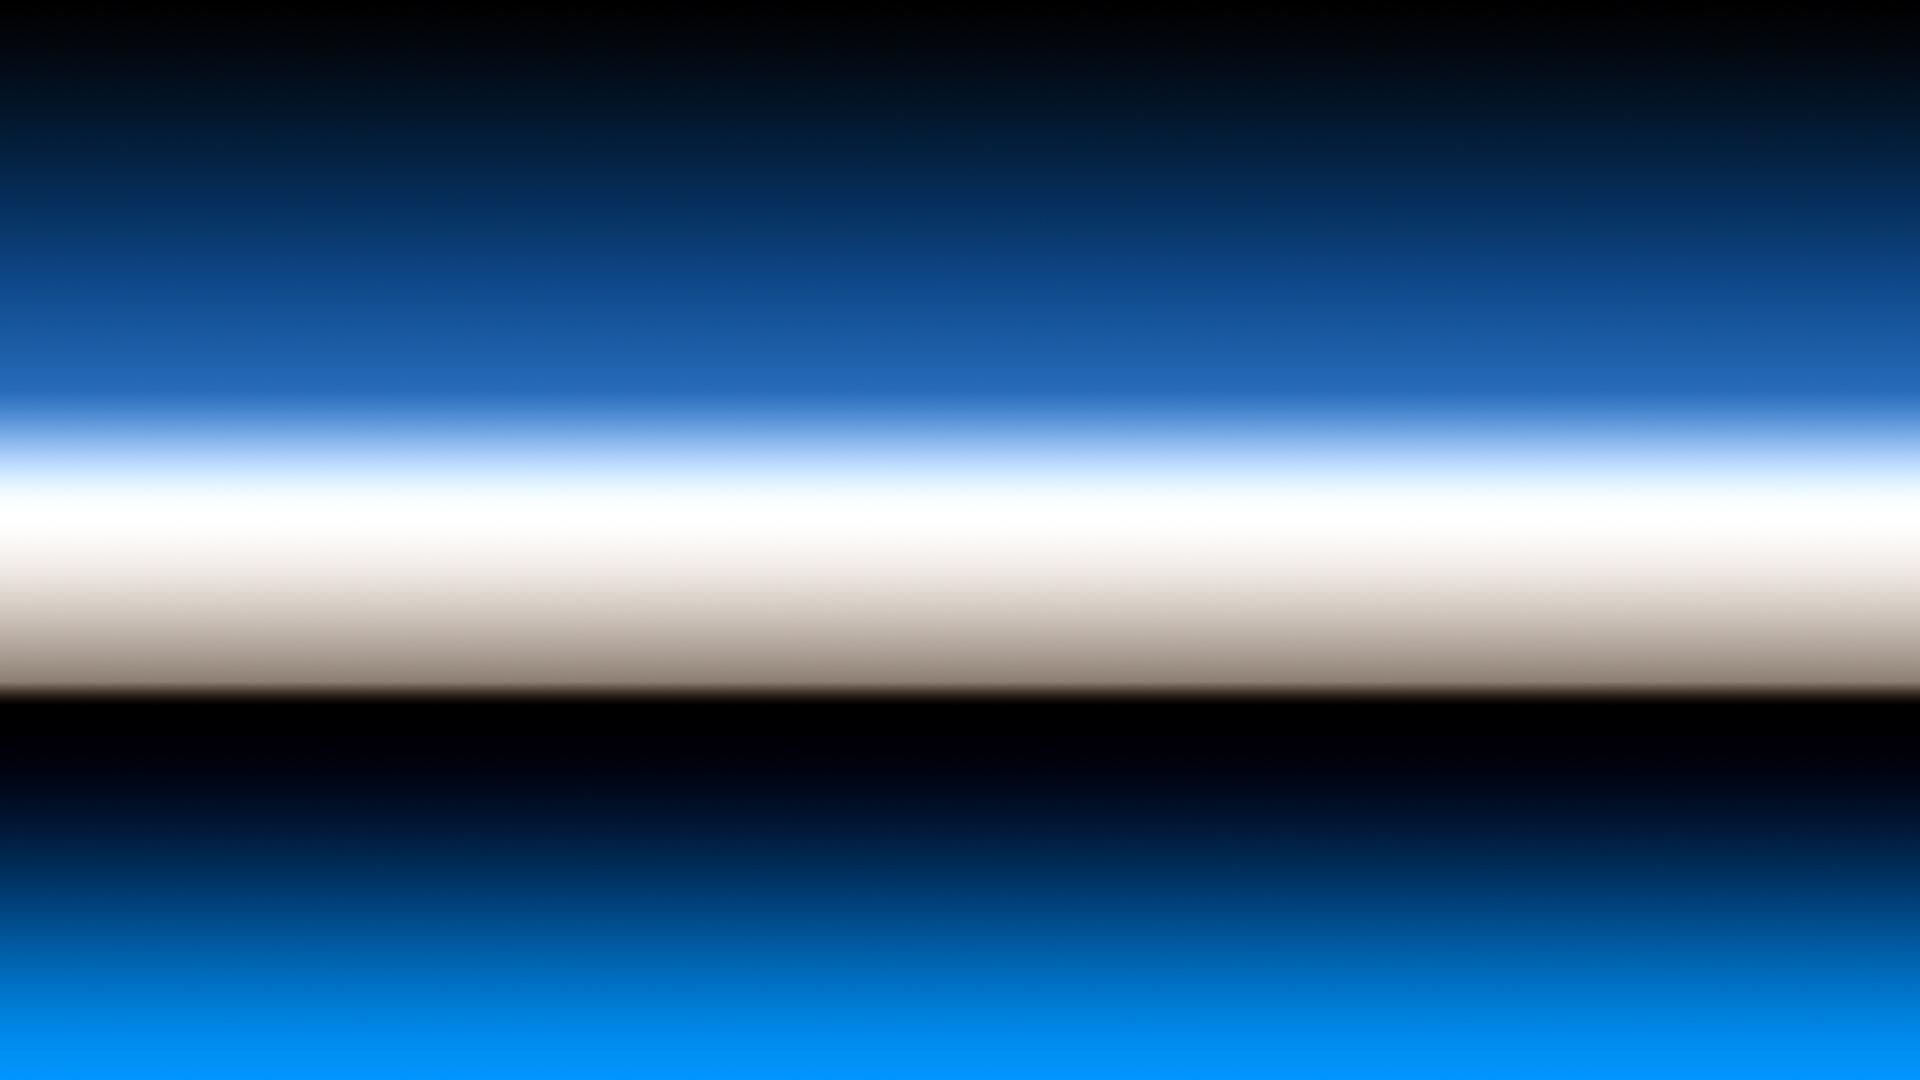 download blue white black gradient desktop wallpaper 1920x1080